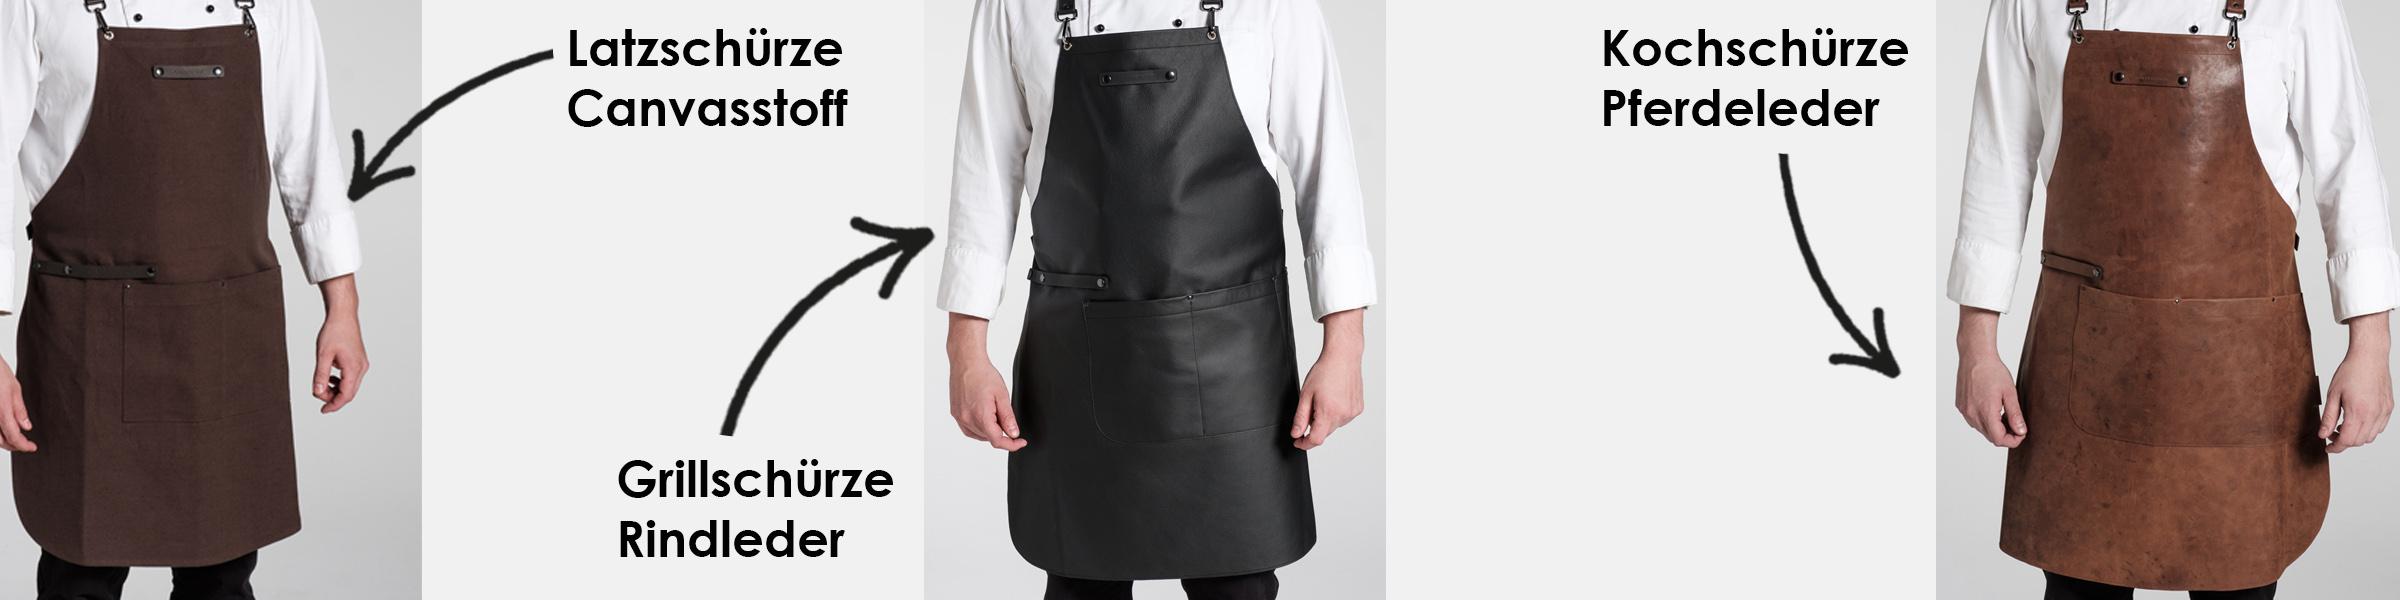 Schürze Nacken entlastendes Trägersystem Kochschürze Lederschürze Grillschürze verschiedene Modelle Canvas Leder